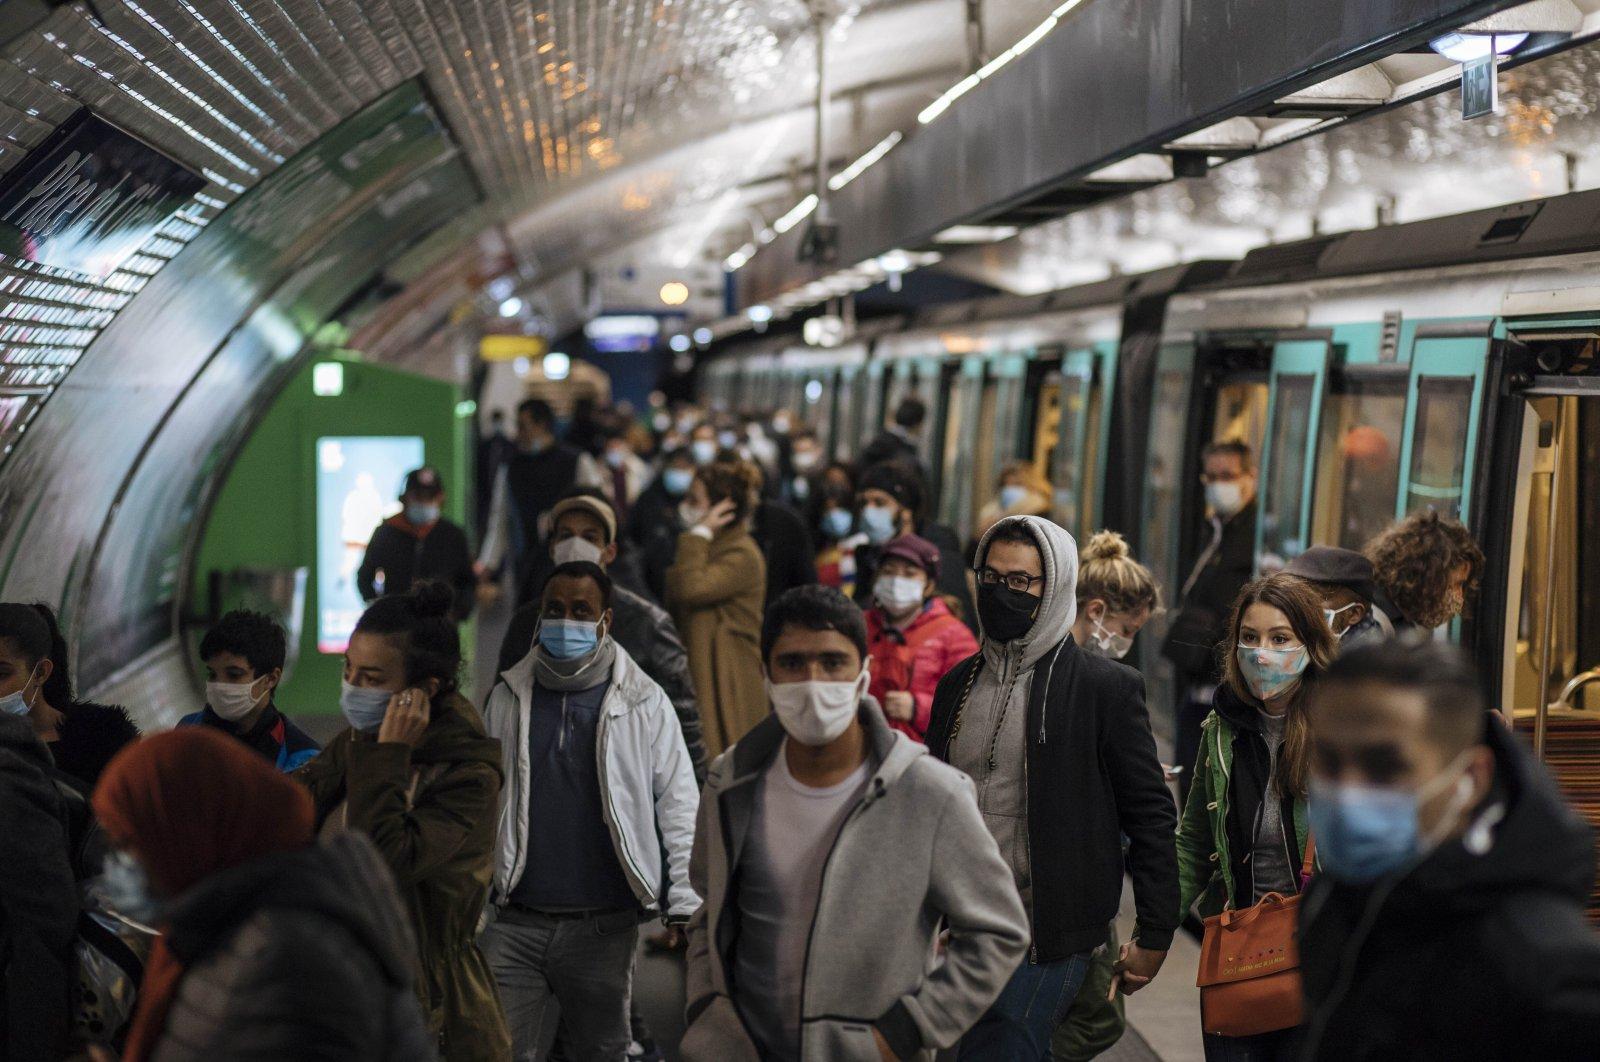 Commuters wearing face masks walk on the platform of a Paris subway, Oct. 25, 2020. (AP Photo)